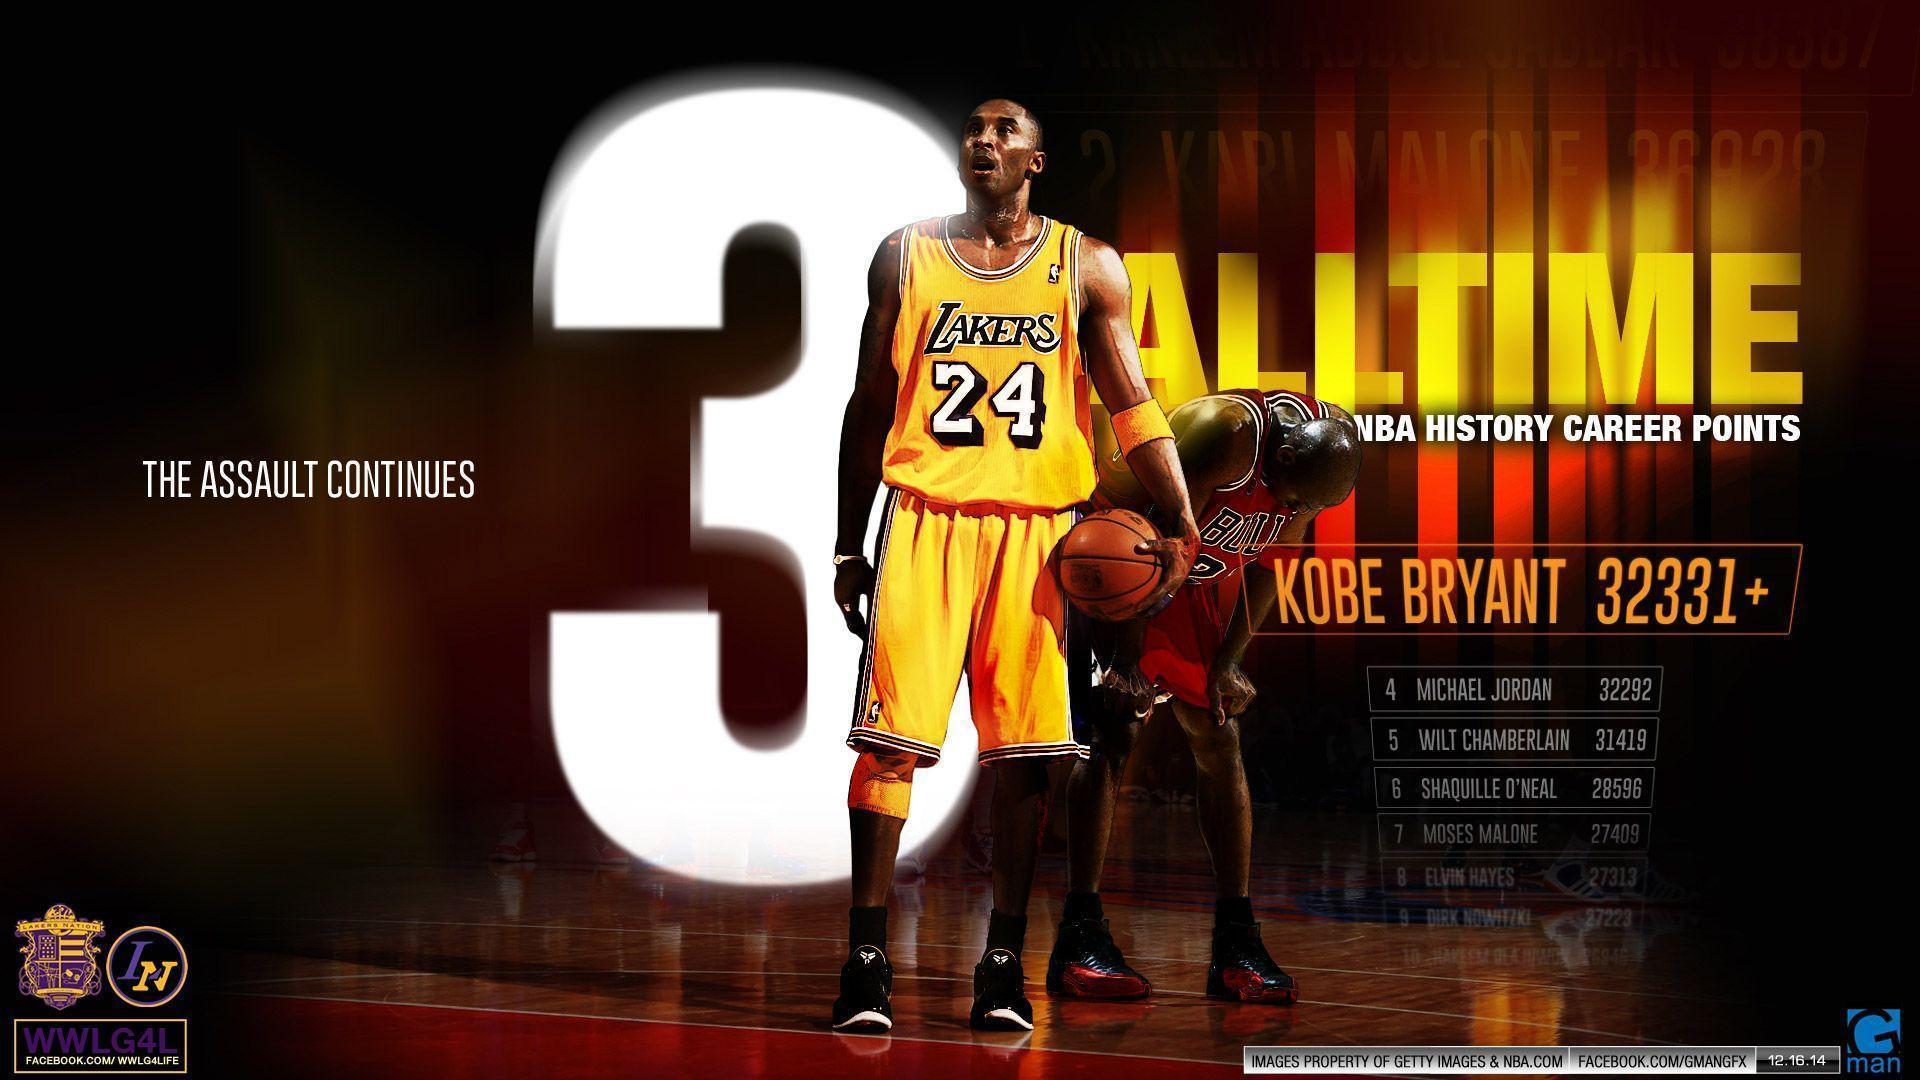 Nba Kobe Bryant Wallpaper: Kobe Bryant Wallpapers HD 2015